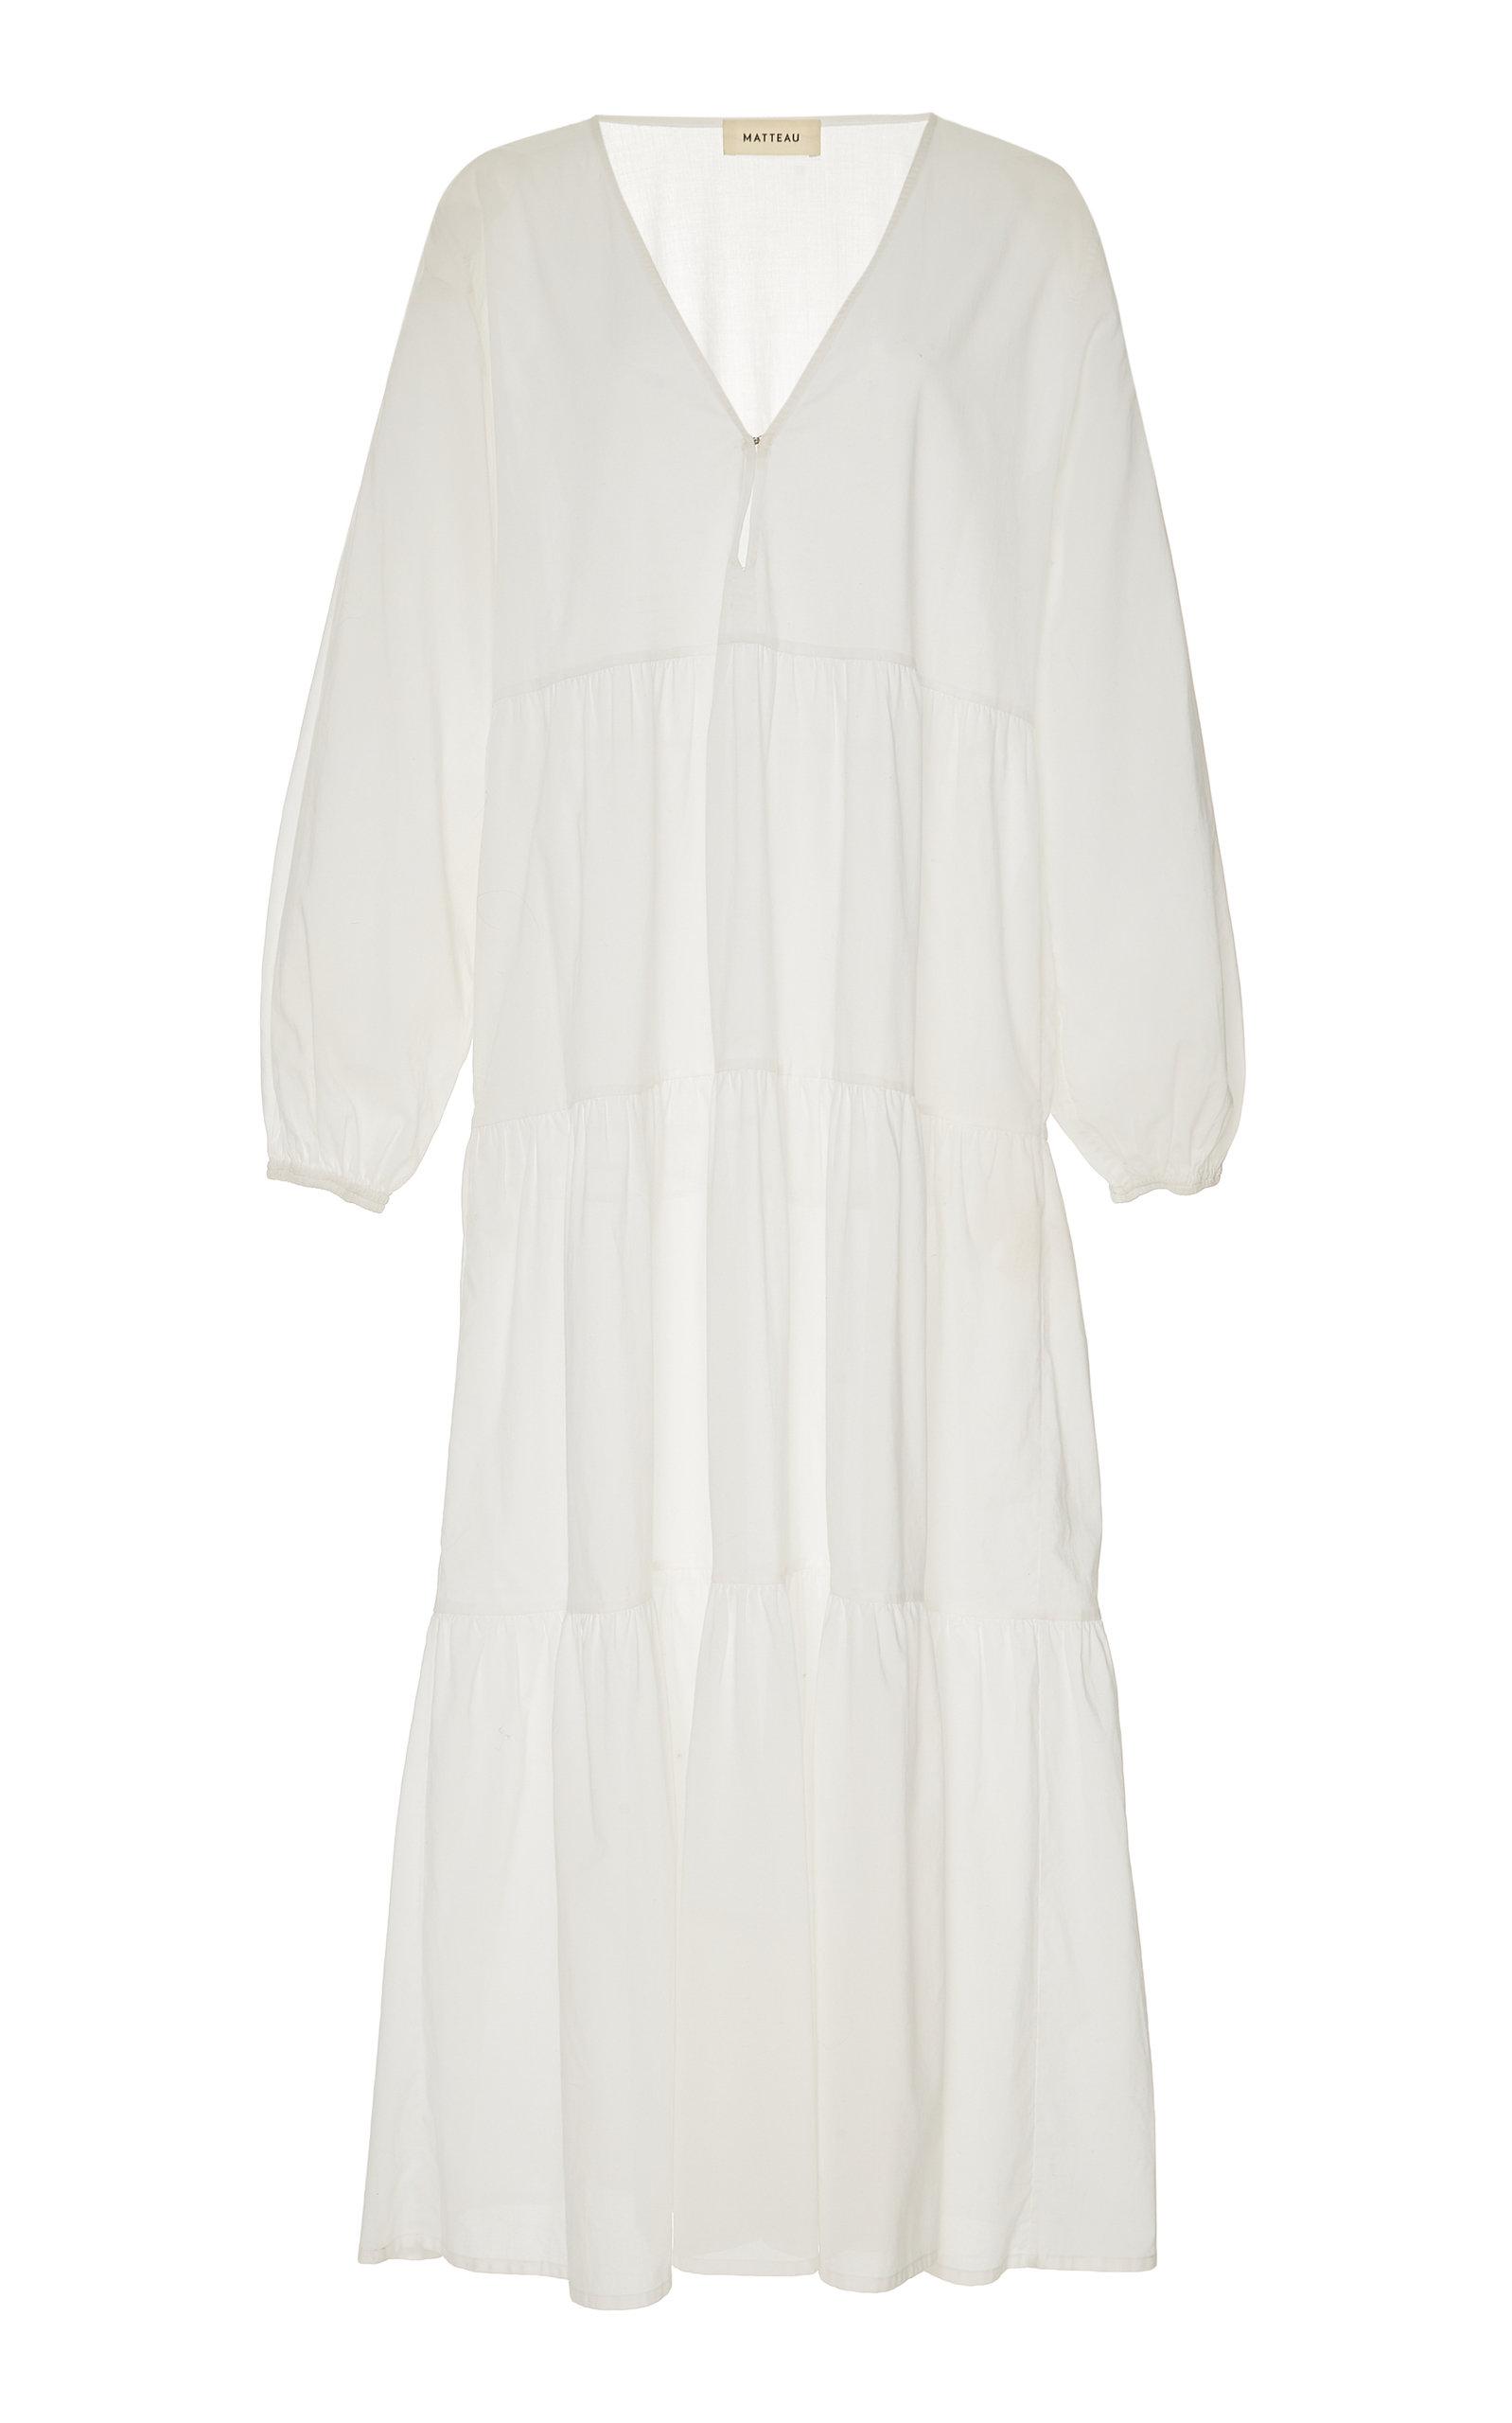 5ce228446e5 Matteau SwimTiered Cotton-Poplin Midi Dress. CLOSE. Loading